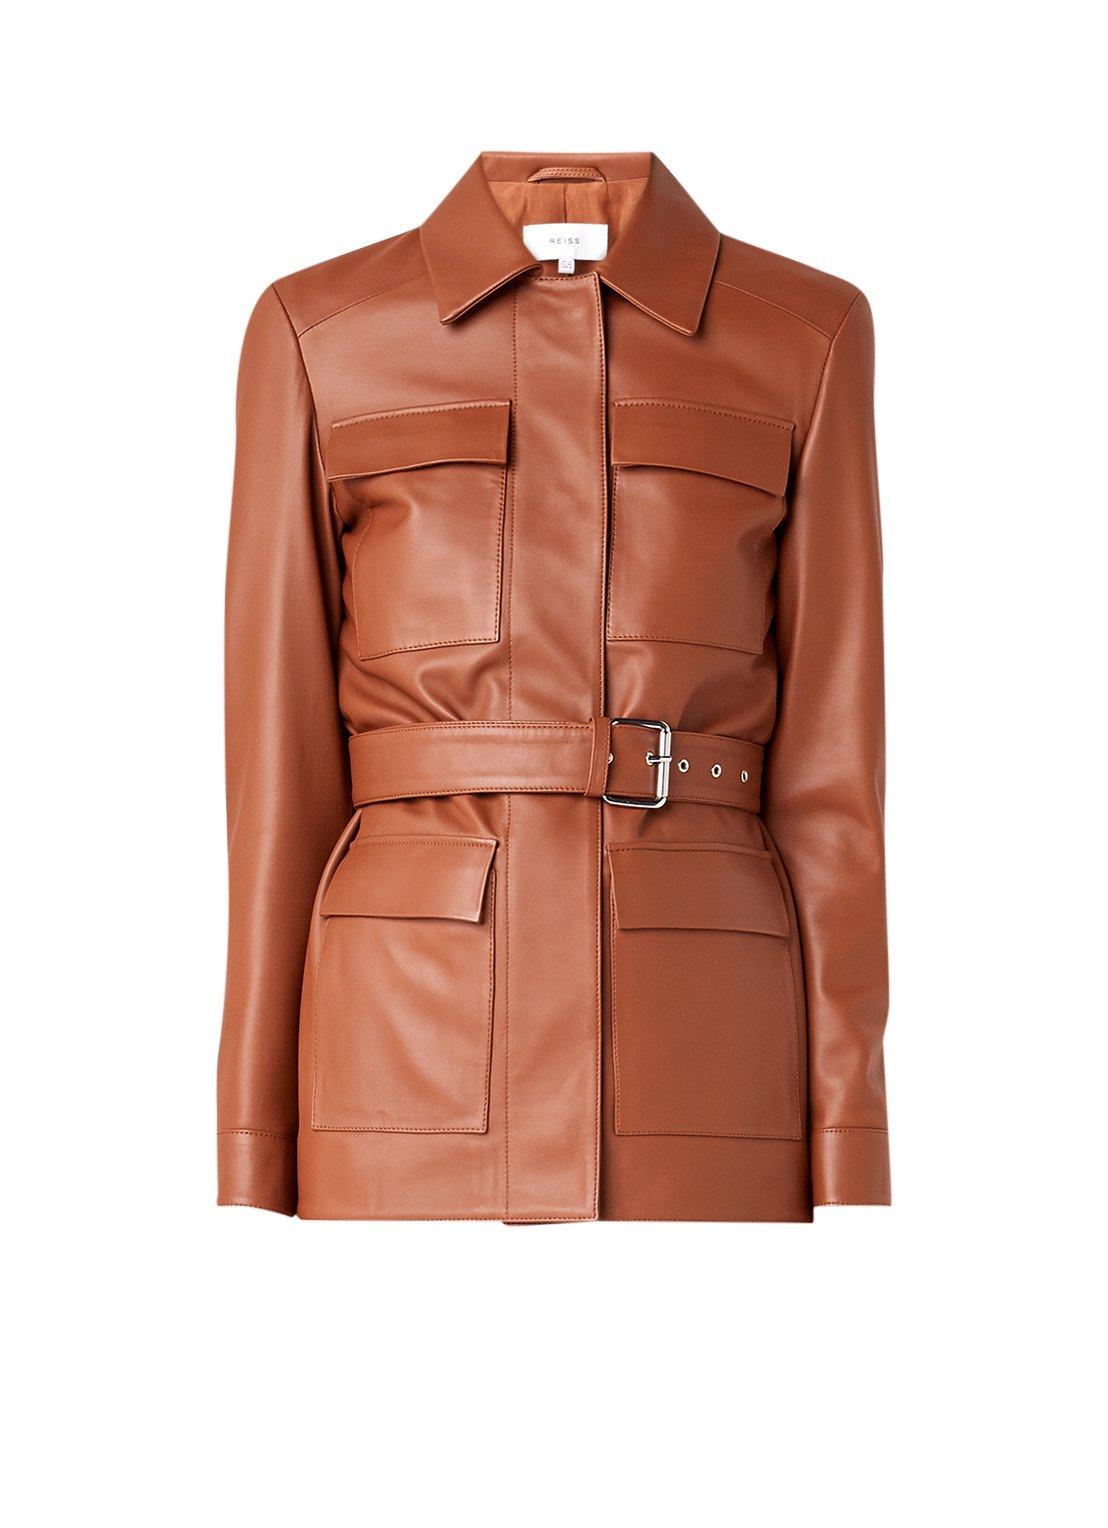 Beste Dames jassen online kopen | Fashionchick.nl | De jassen trends JN-68